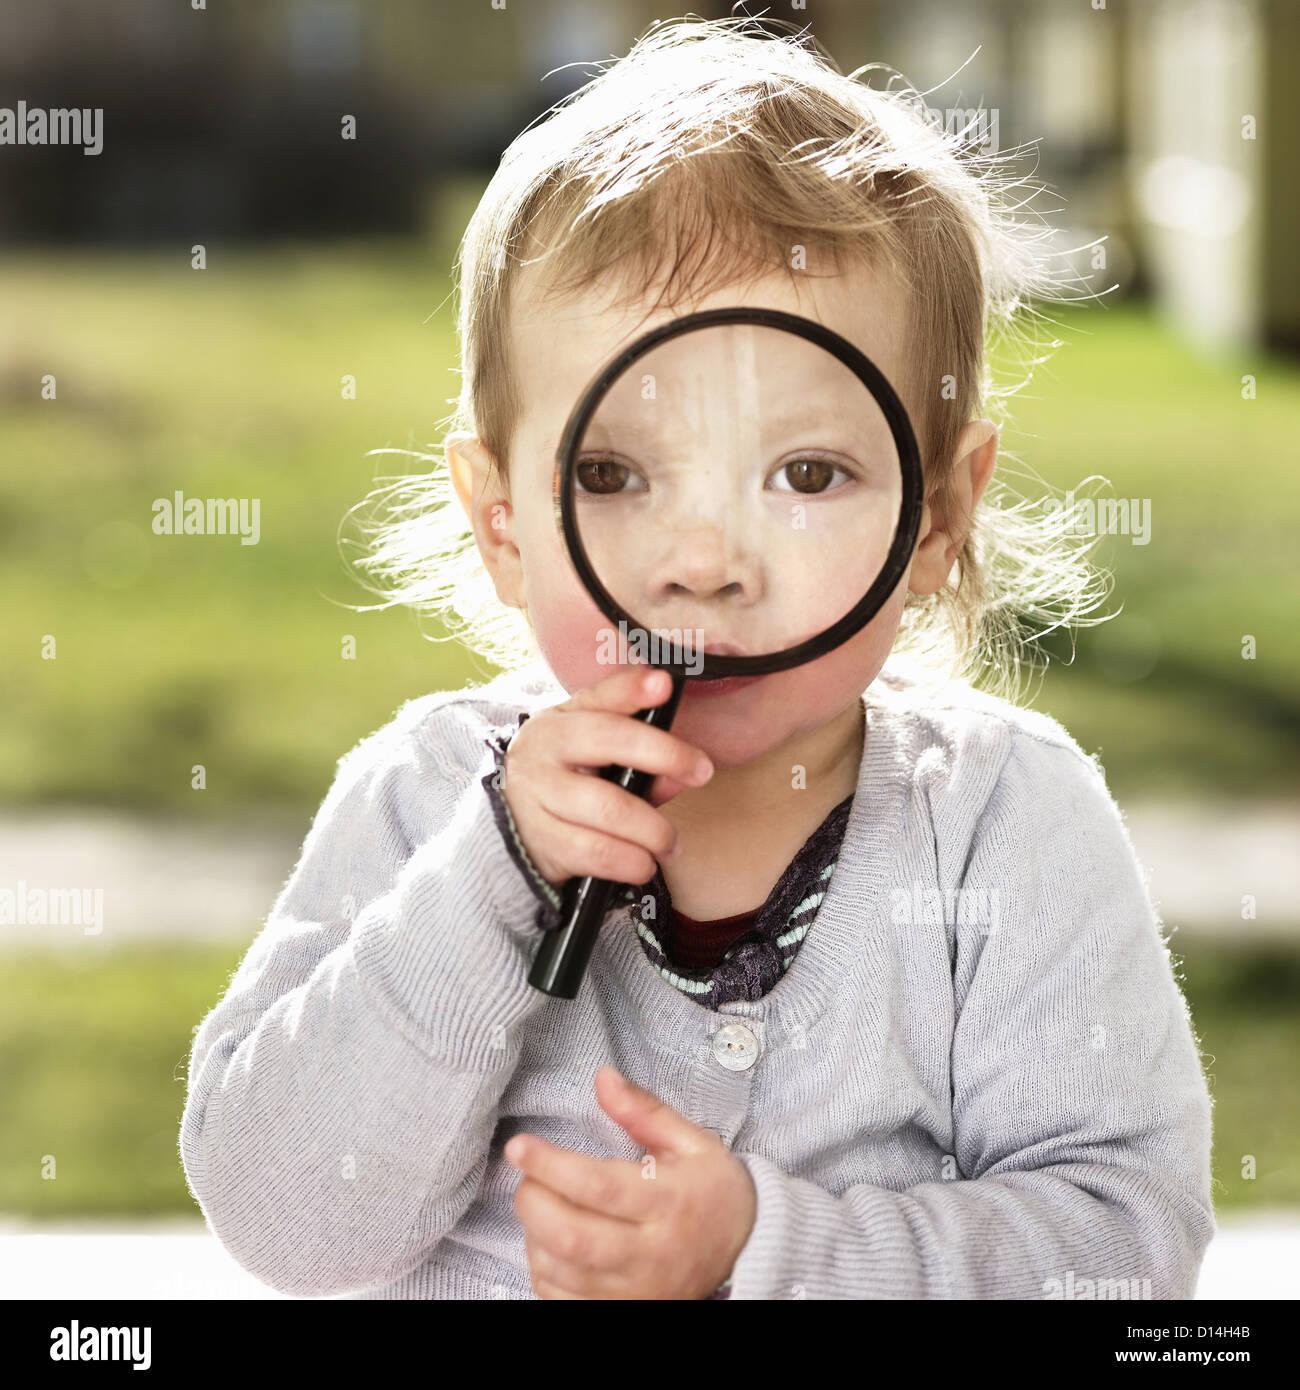 Toddler girl holding magnifying glass - Stock Image